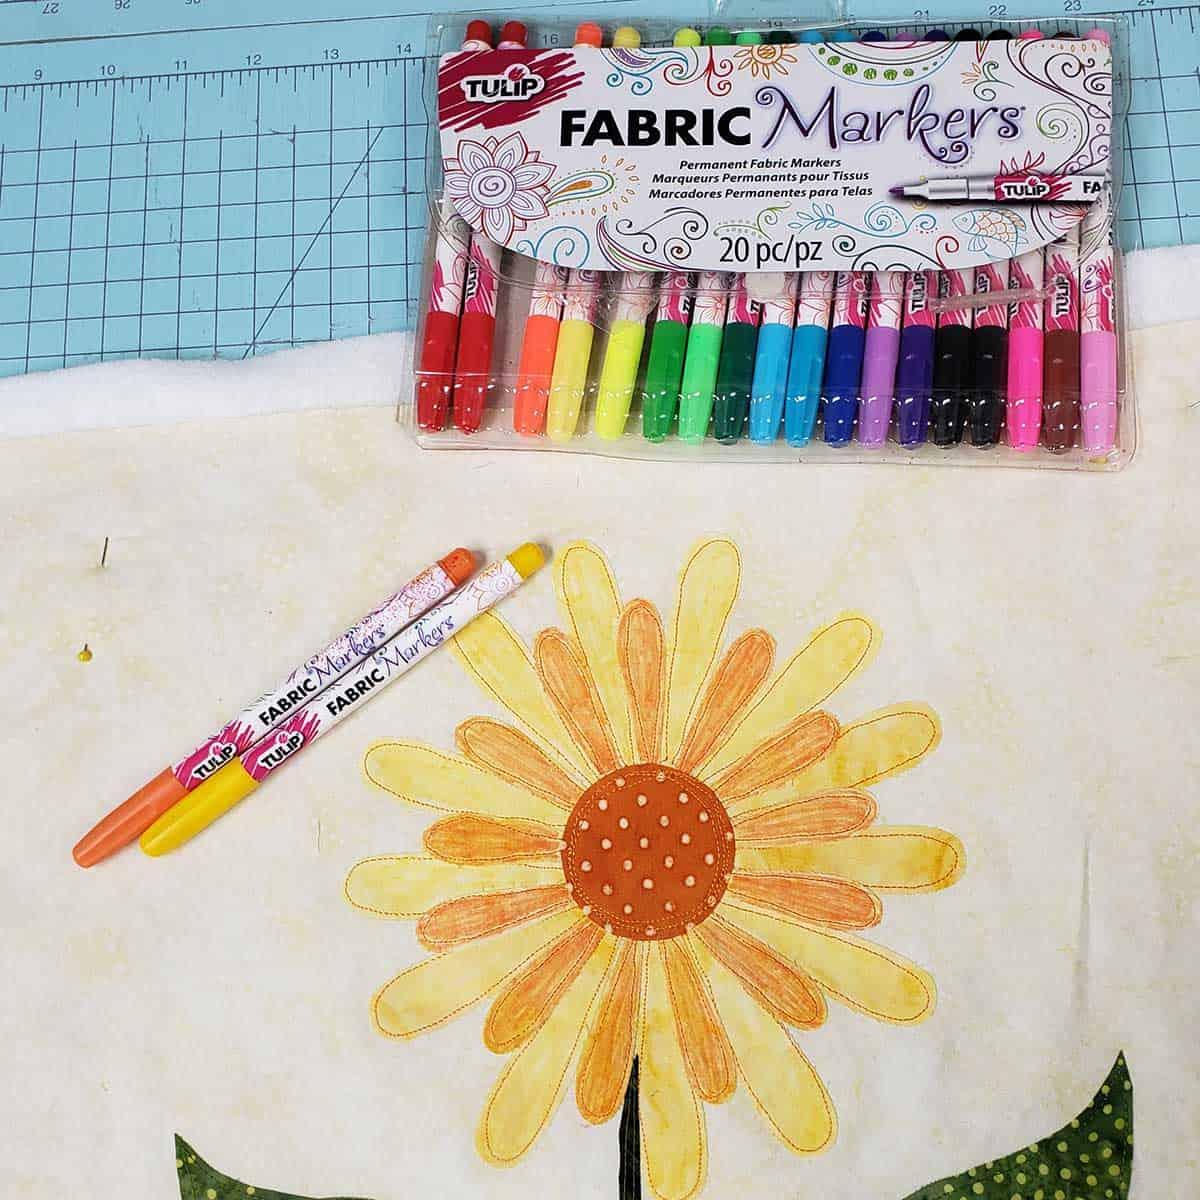 Coloring the daisy applique pieces